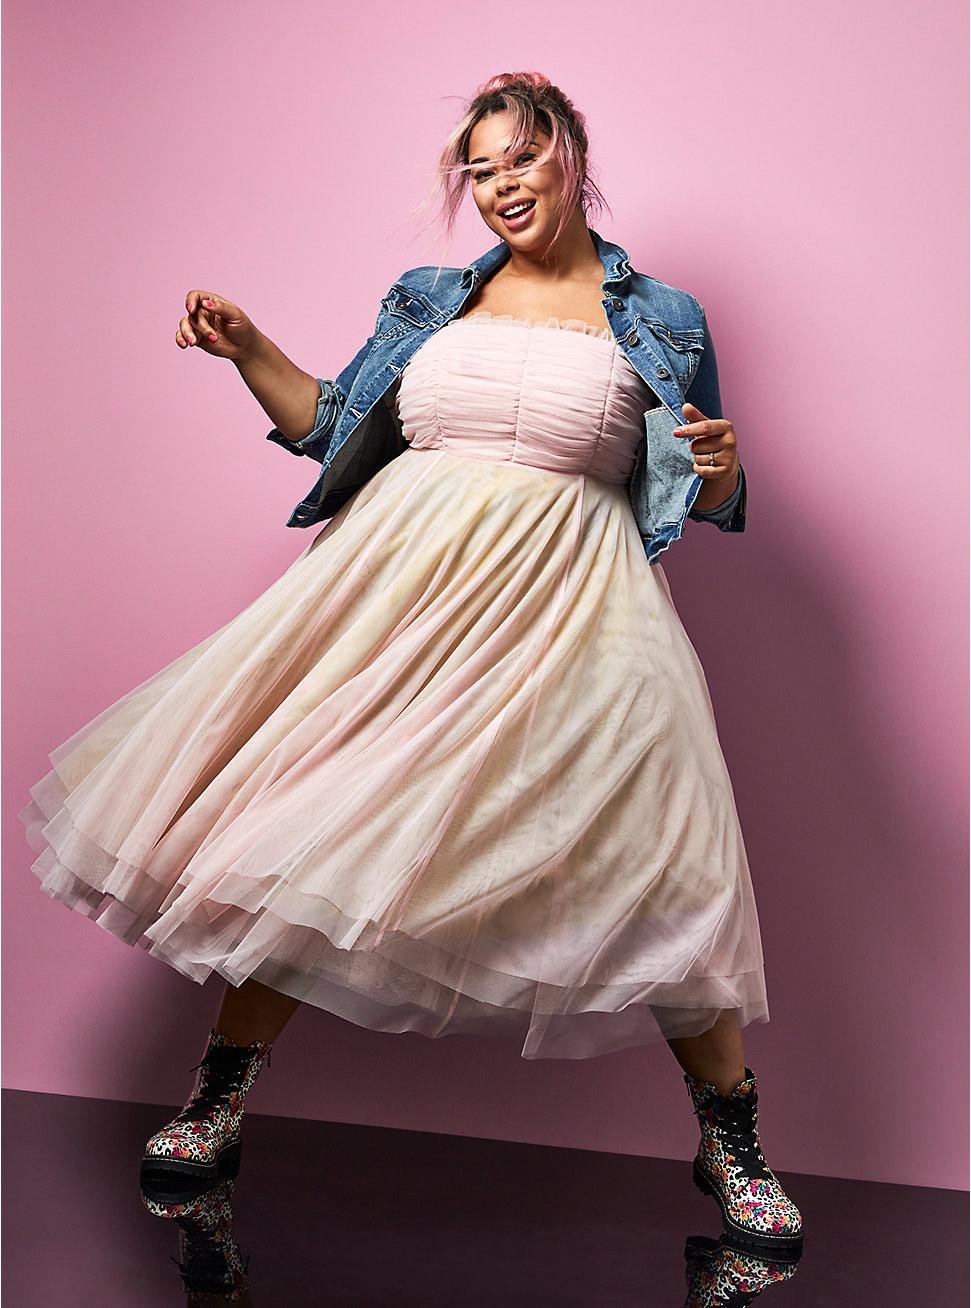 a model wearing the strapless tule dress